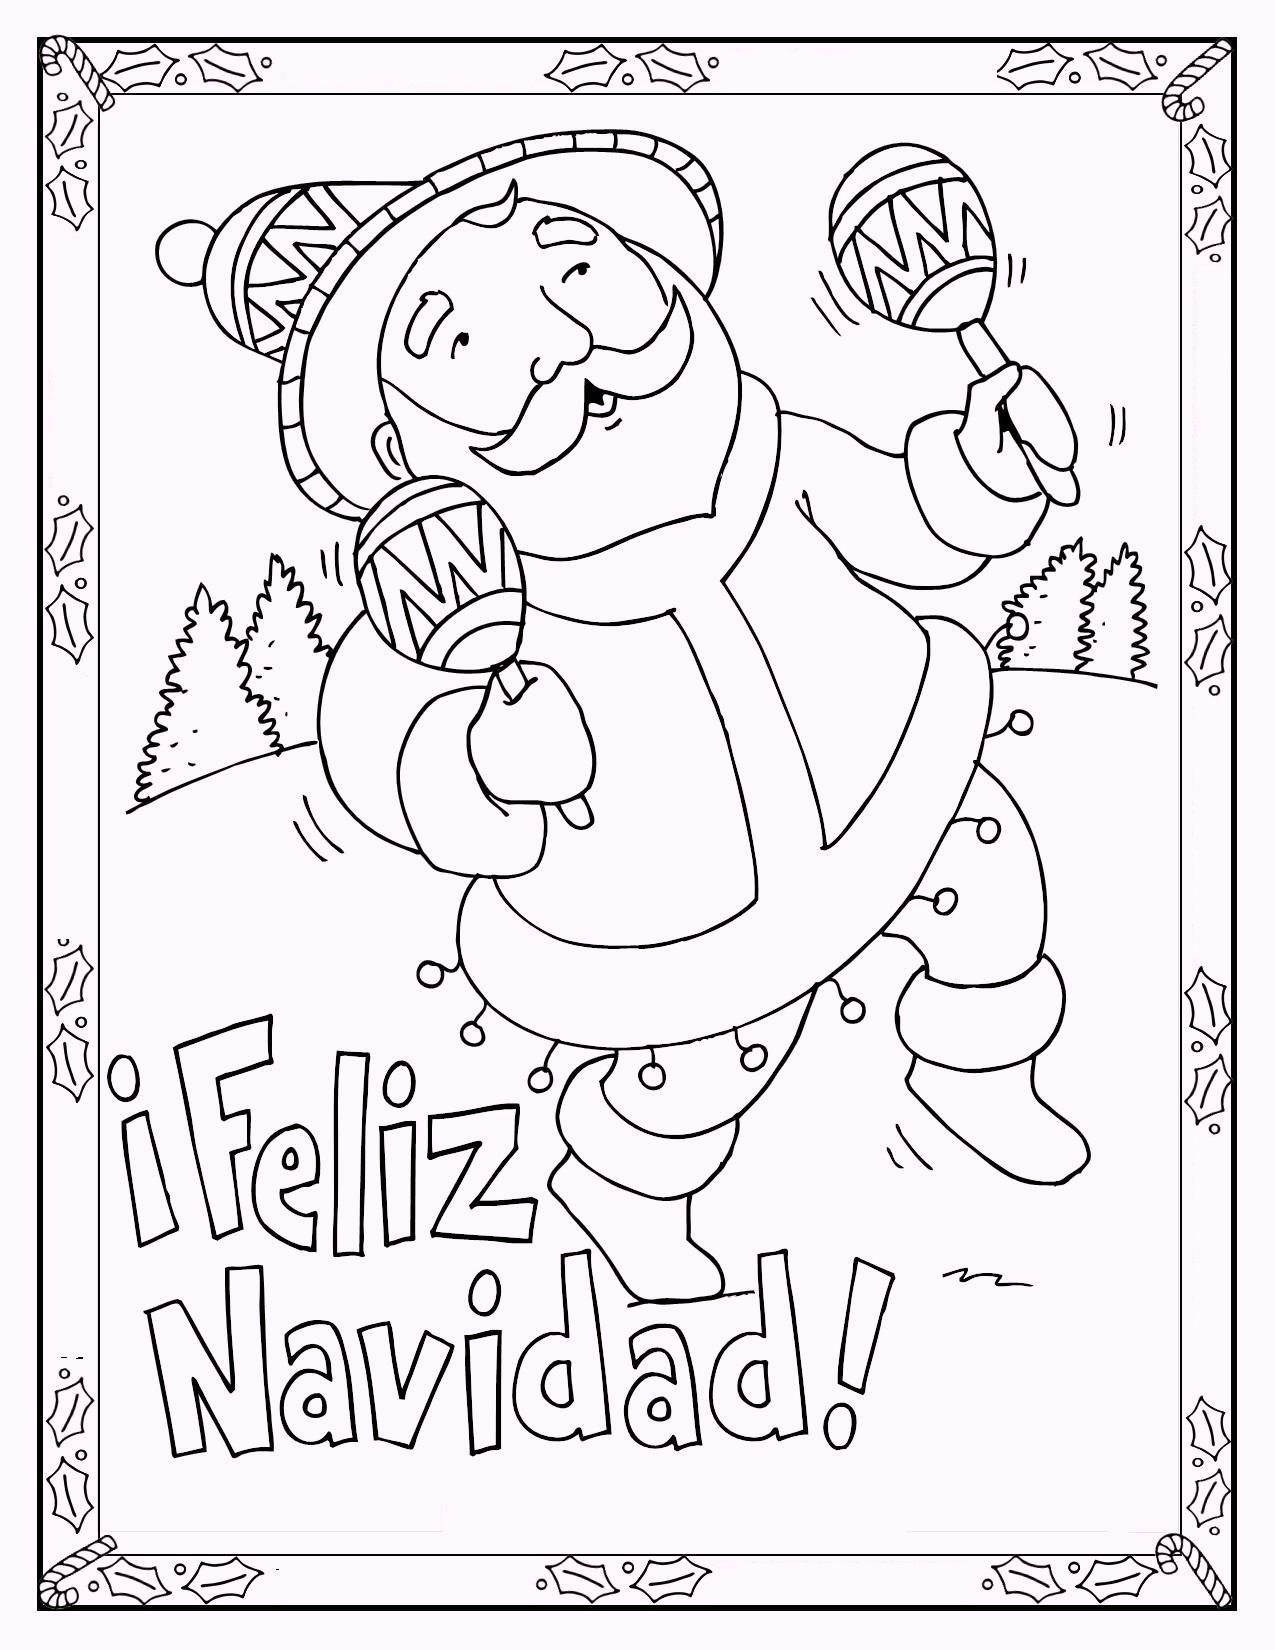 feliz_navidad_christmas_in_spain_coloring_page